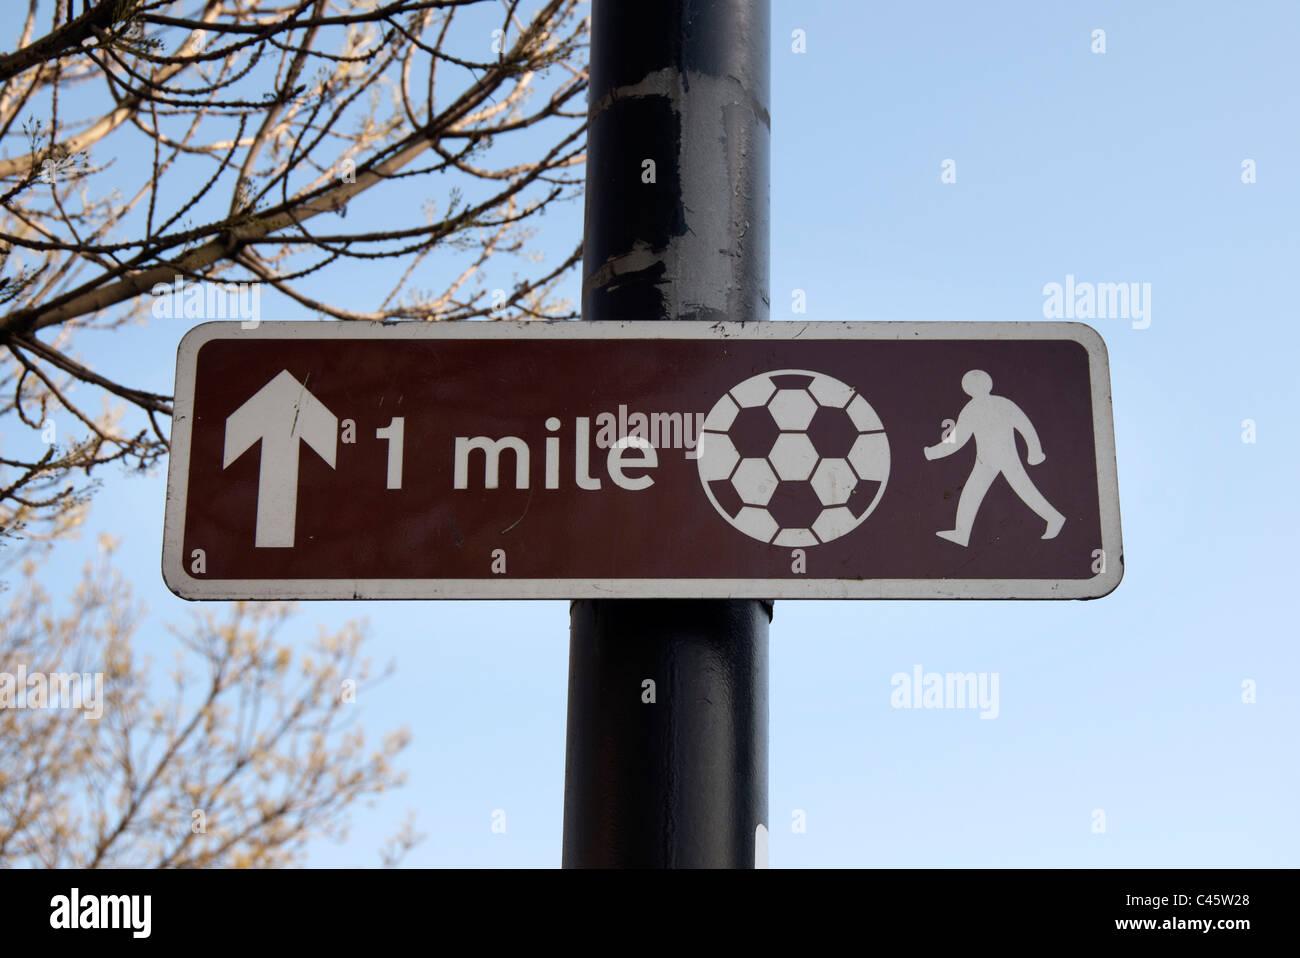 1 mile sign to Southampton football stadium - Stock Image